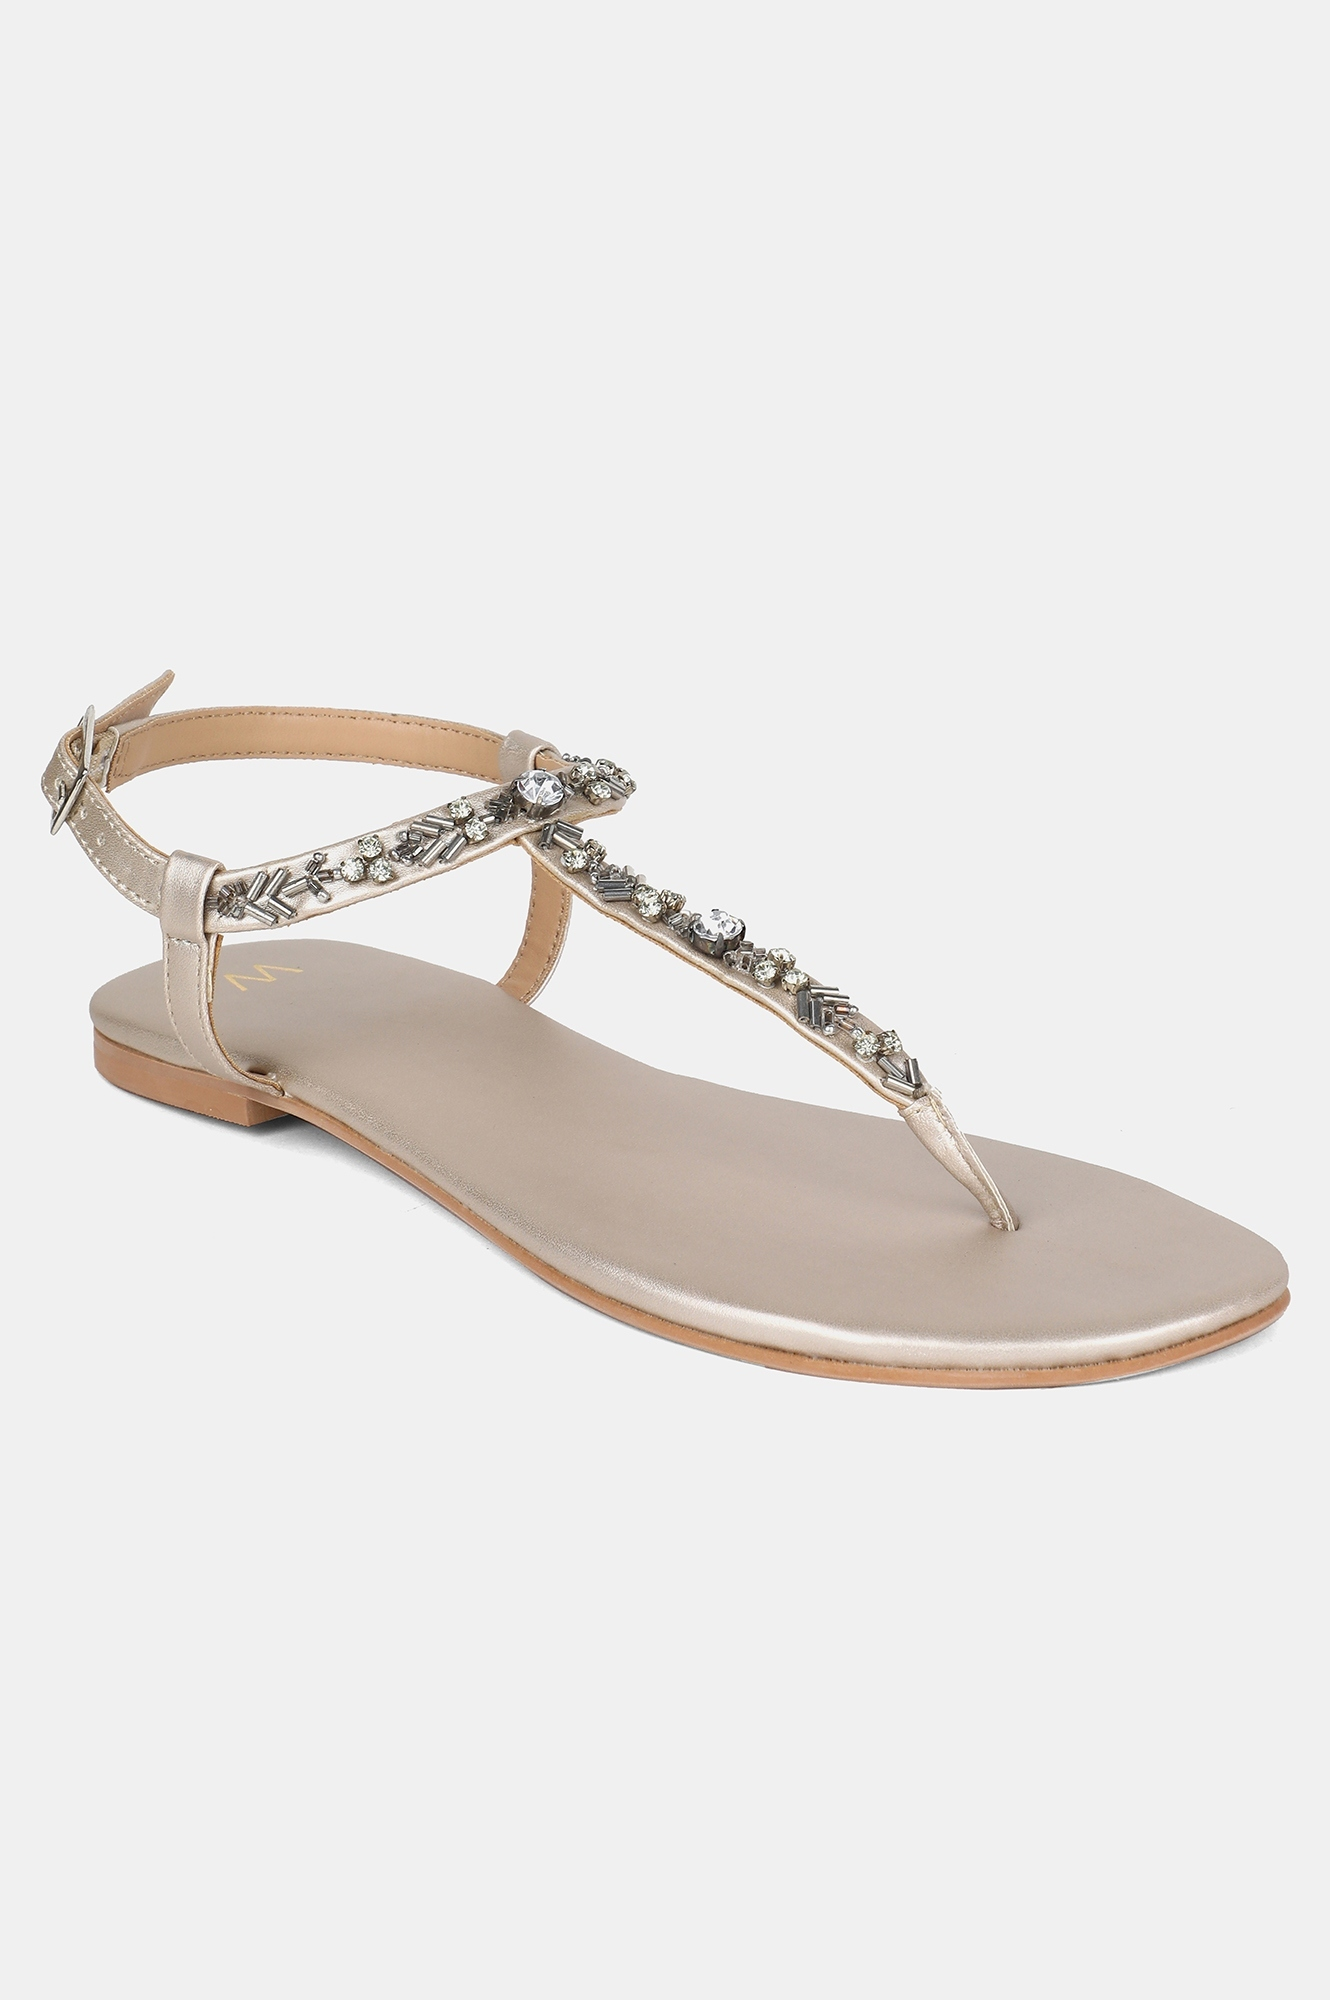 W | W Gold Almond Toe Embellished Flat